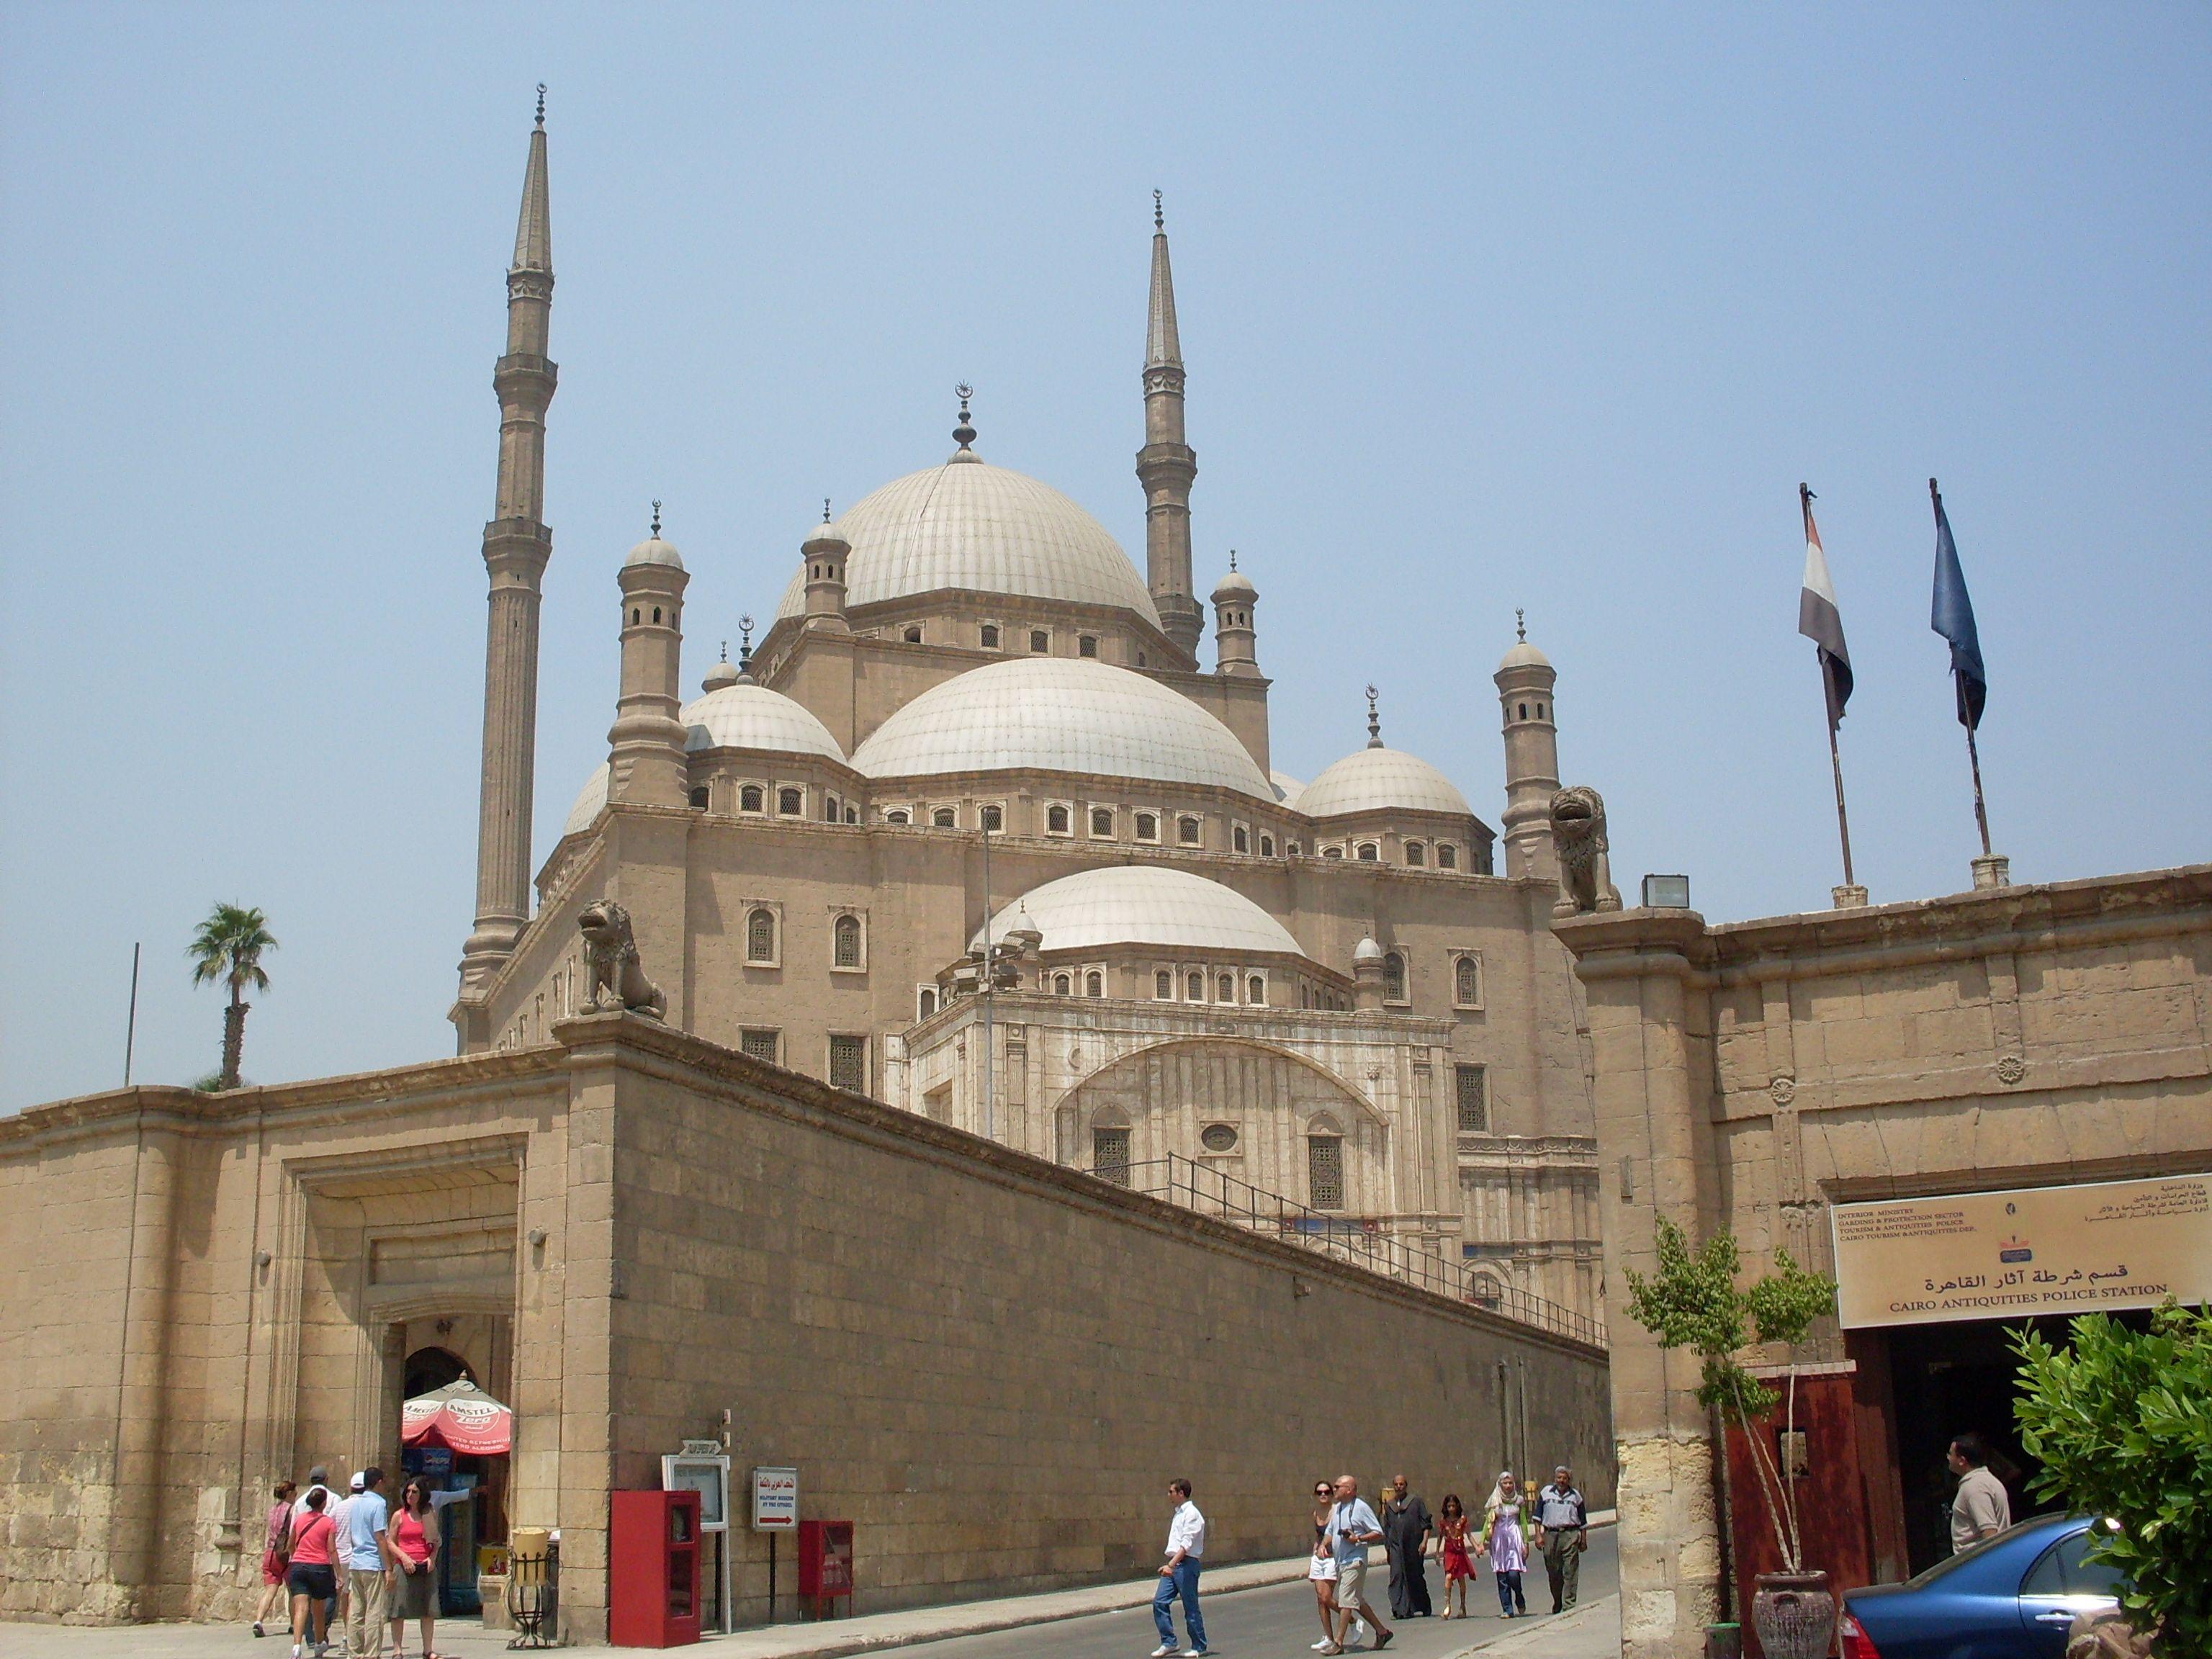 Mosque of Muhammad Ali Citadel